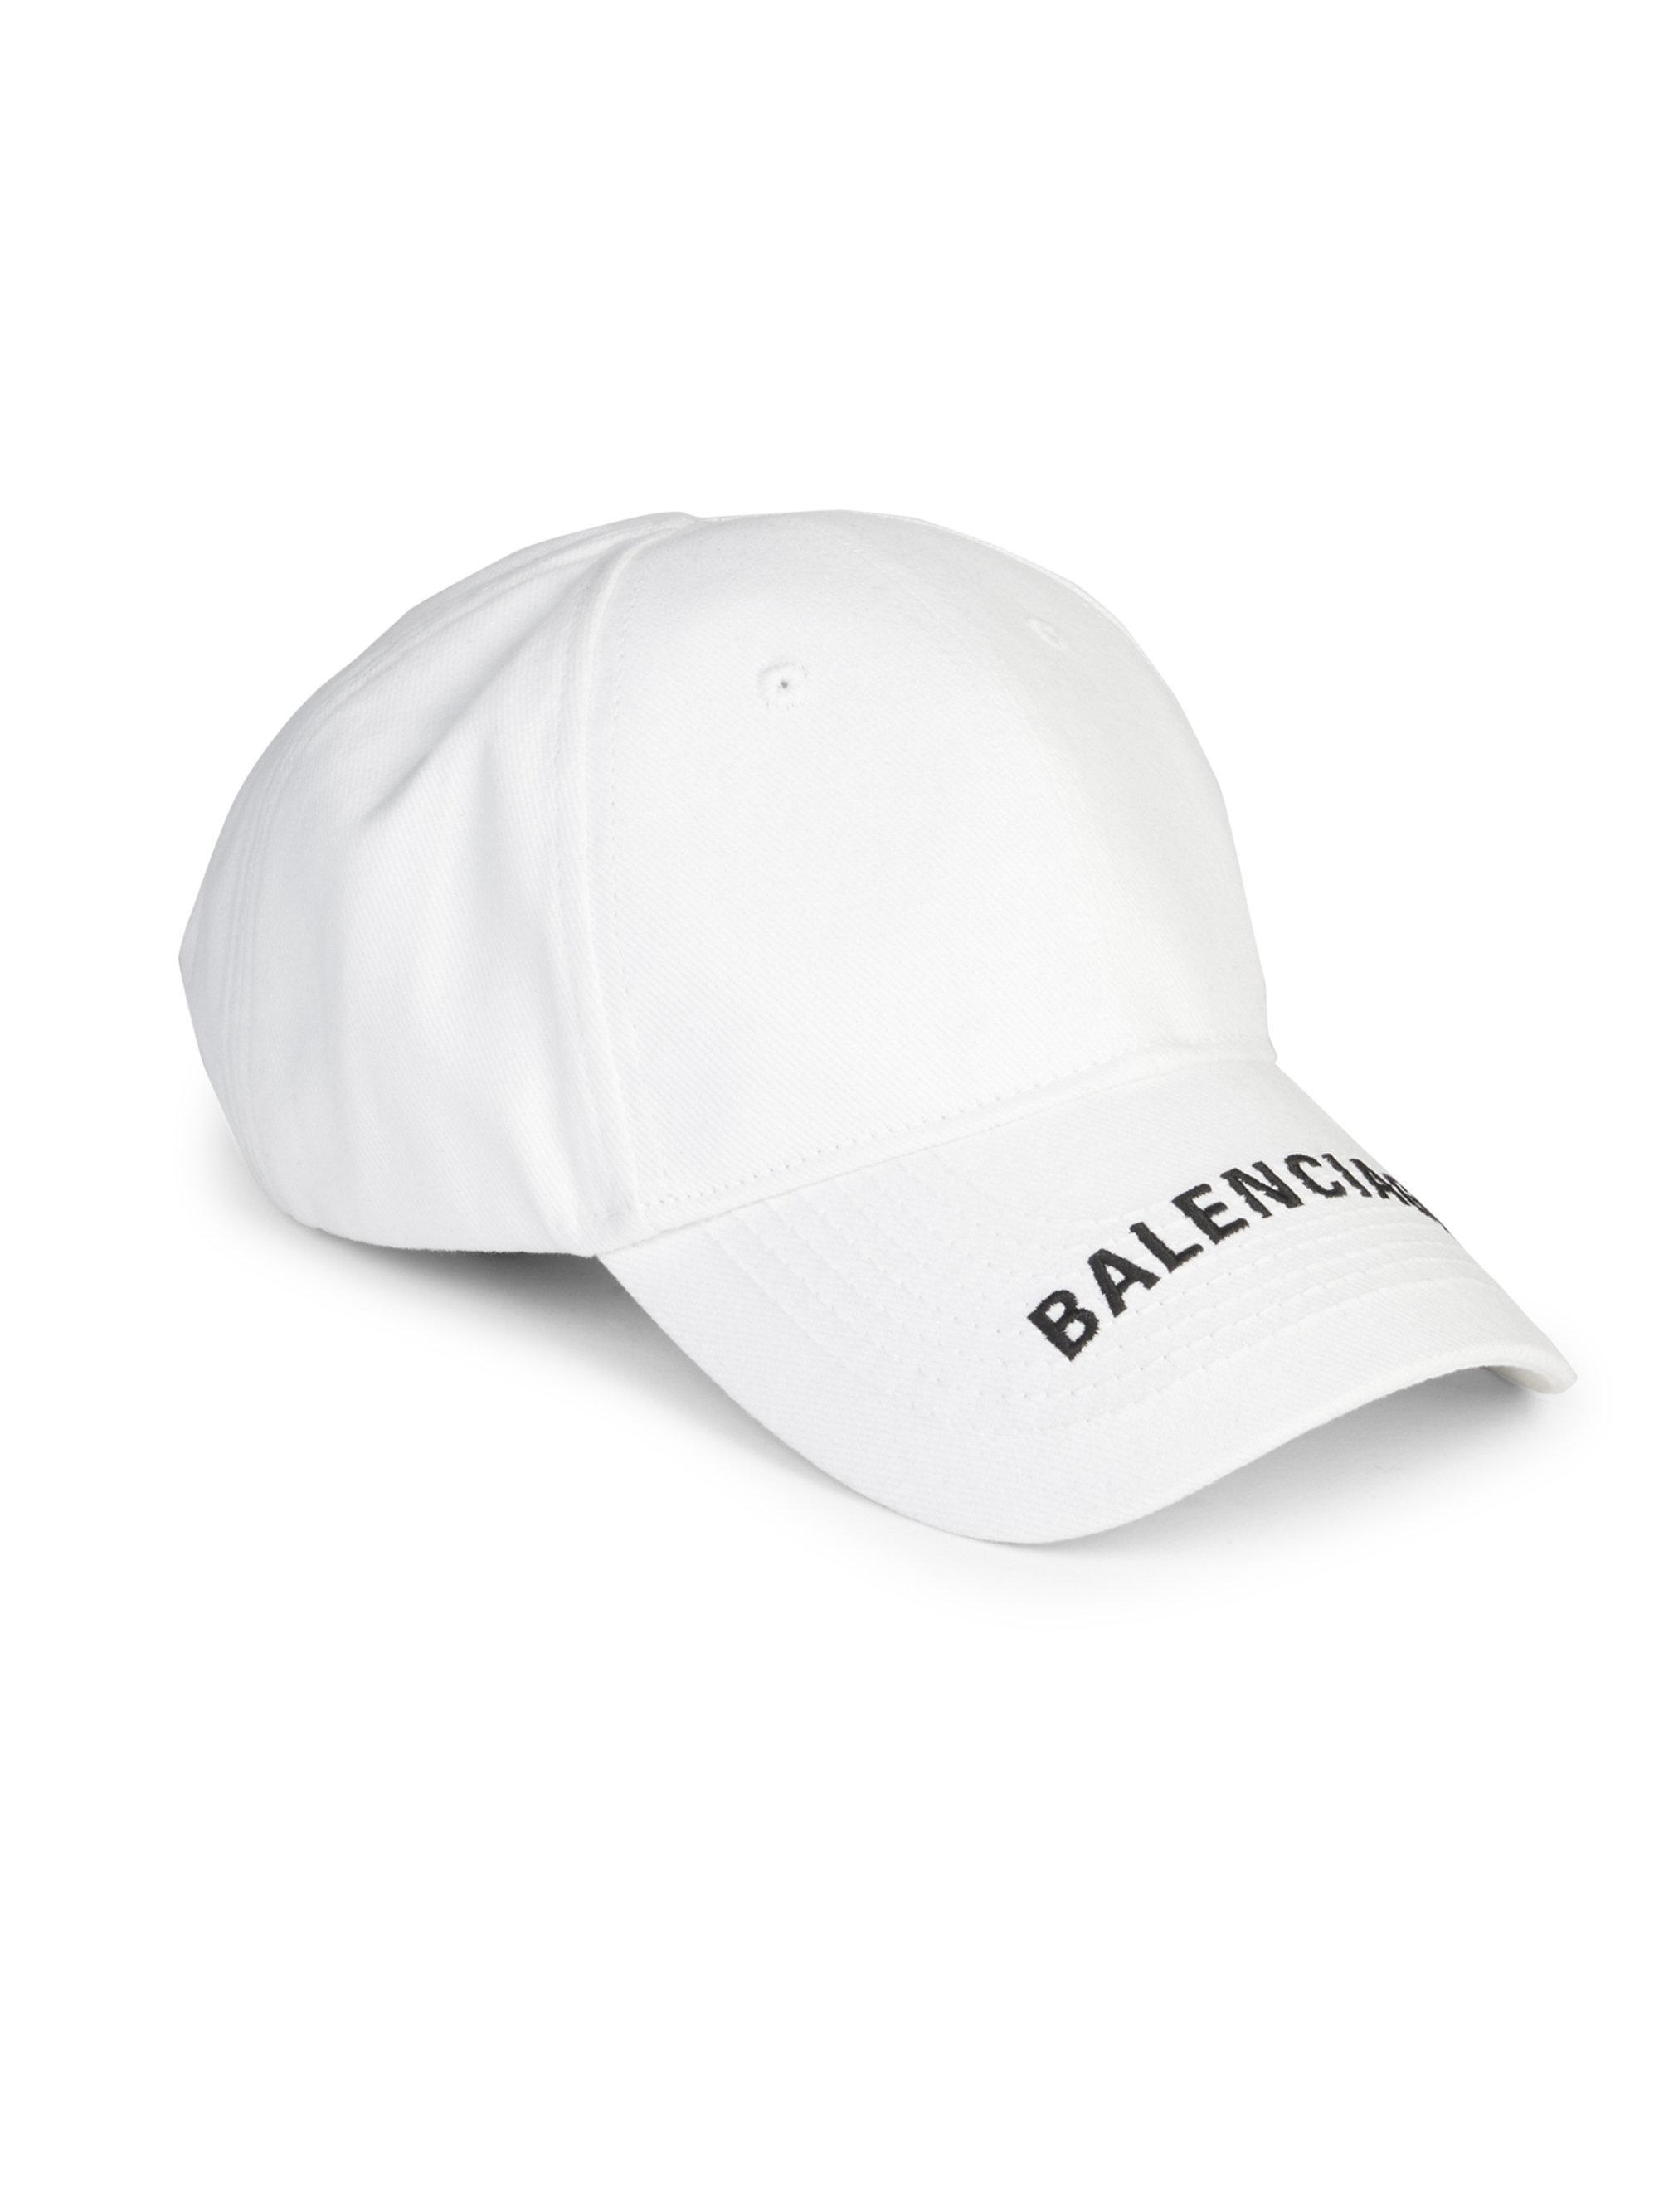 Balenciaga Cotton Cap in White - Lyst